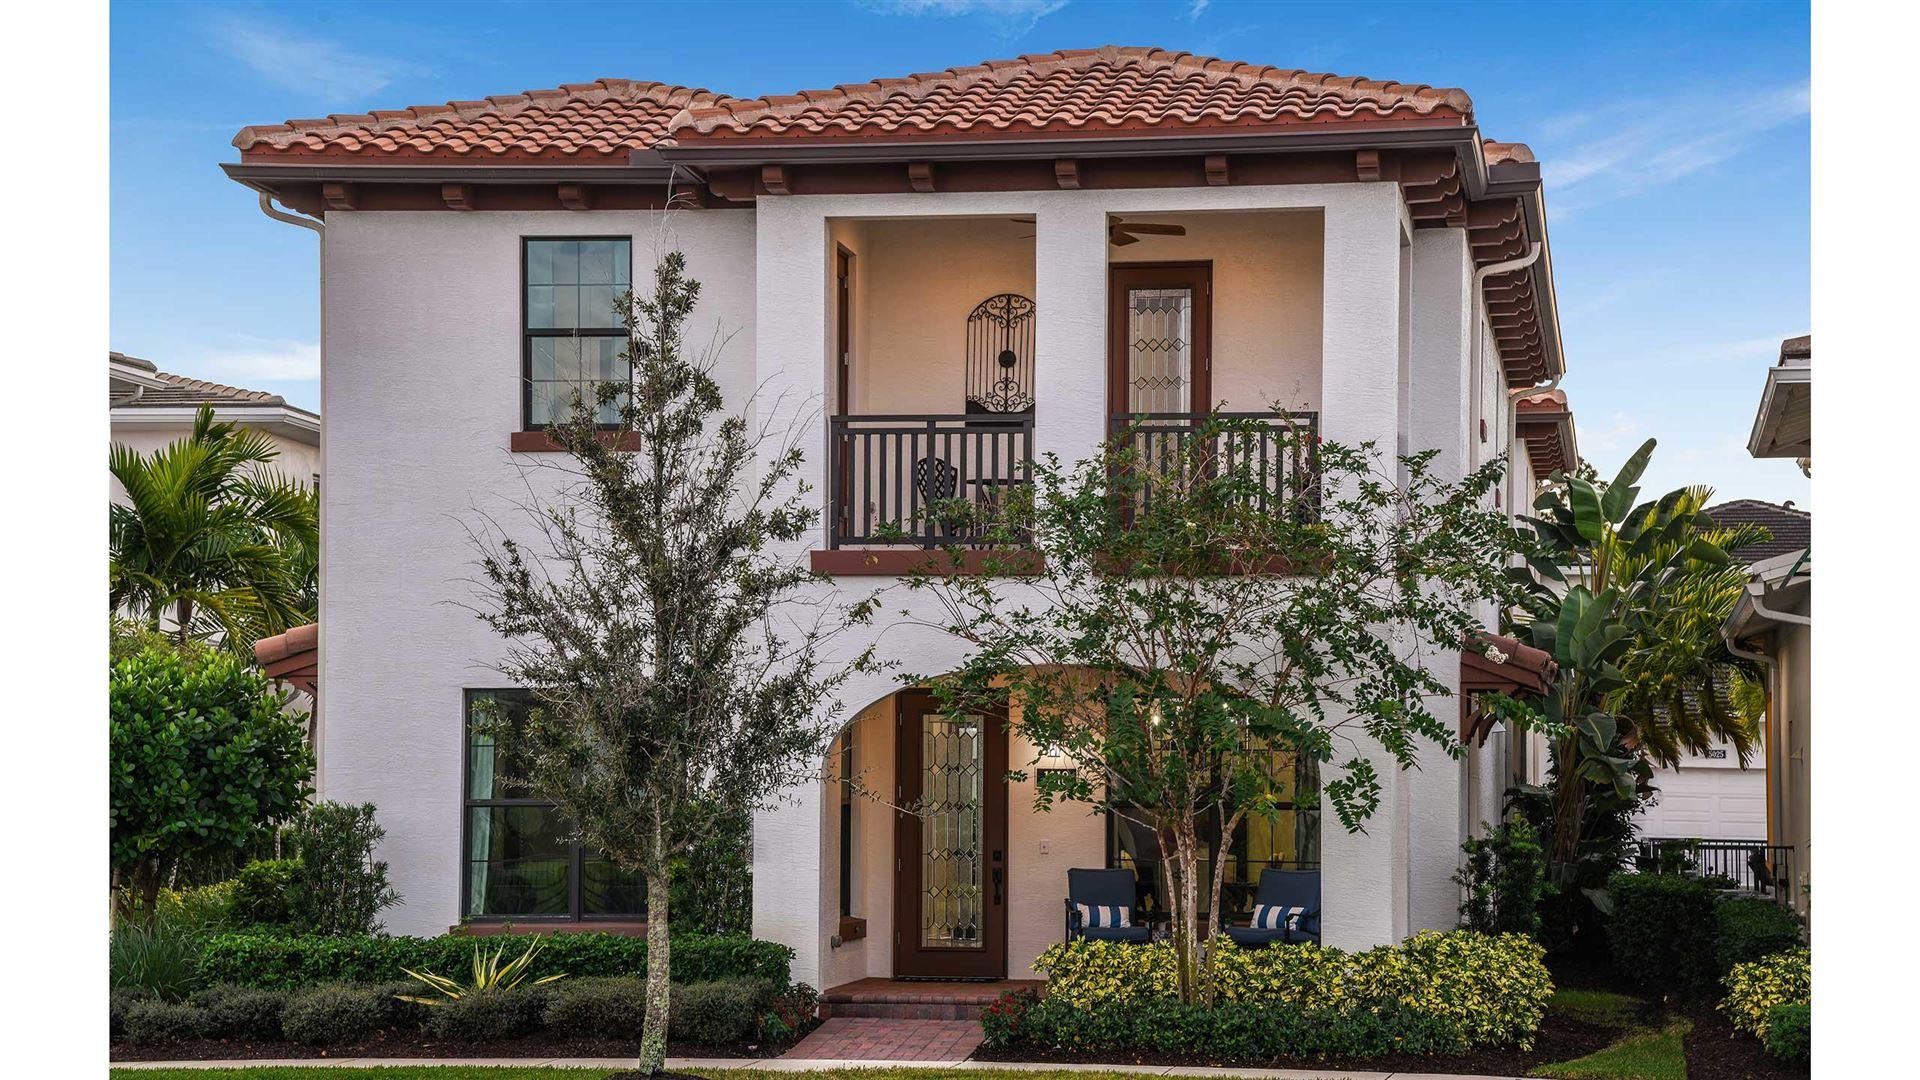 Photo of 13317 Machiavelli Way, Palm Beach Gardens, FL 33418 (MLS # RX-10682666)